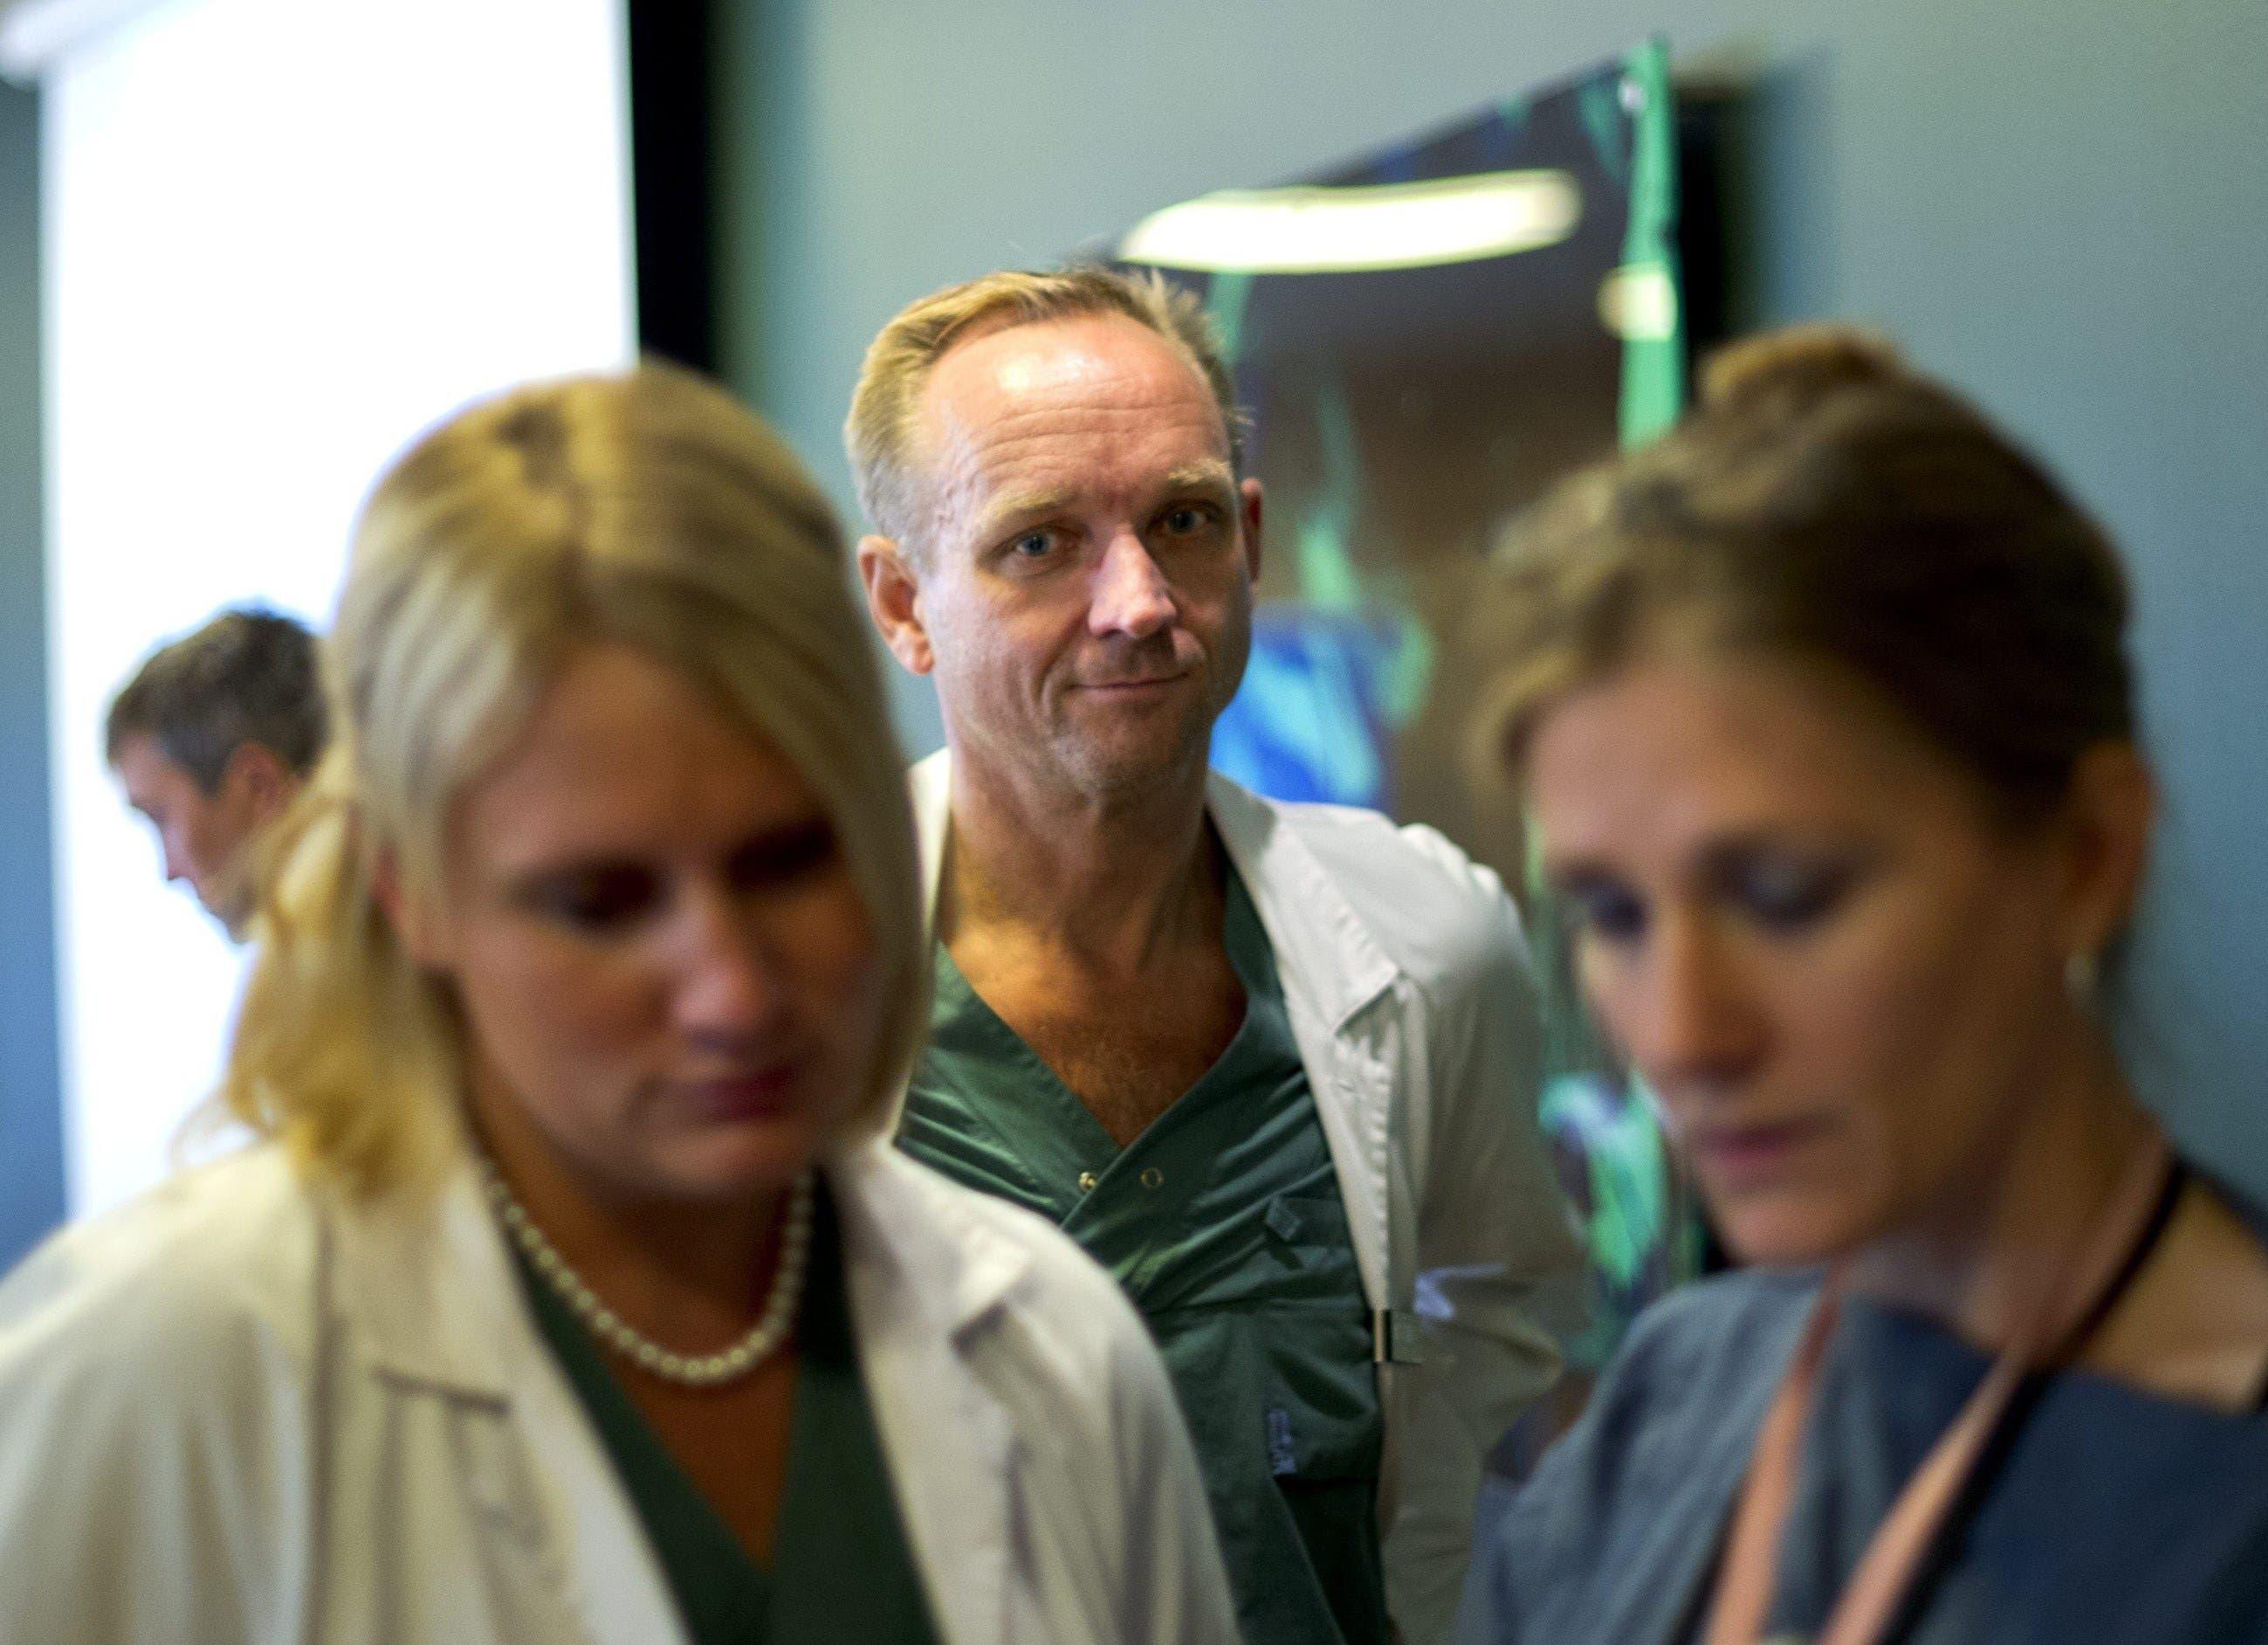 A picture taken on September 18, 2012 shows Doctor Mats Braennstroem (C) during a press conference about the first uterus transplant at the Sahlgreska hospital in Gothenburg, Sweden. (AFP)